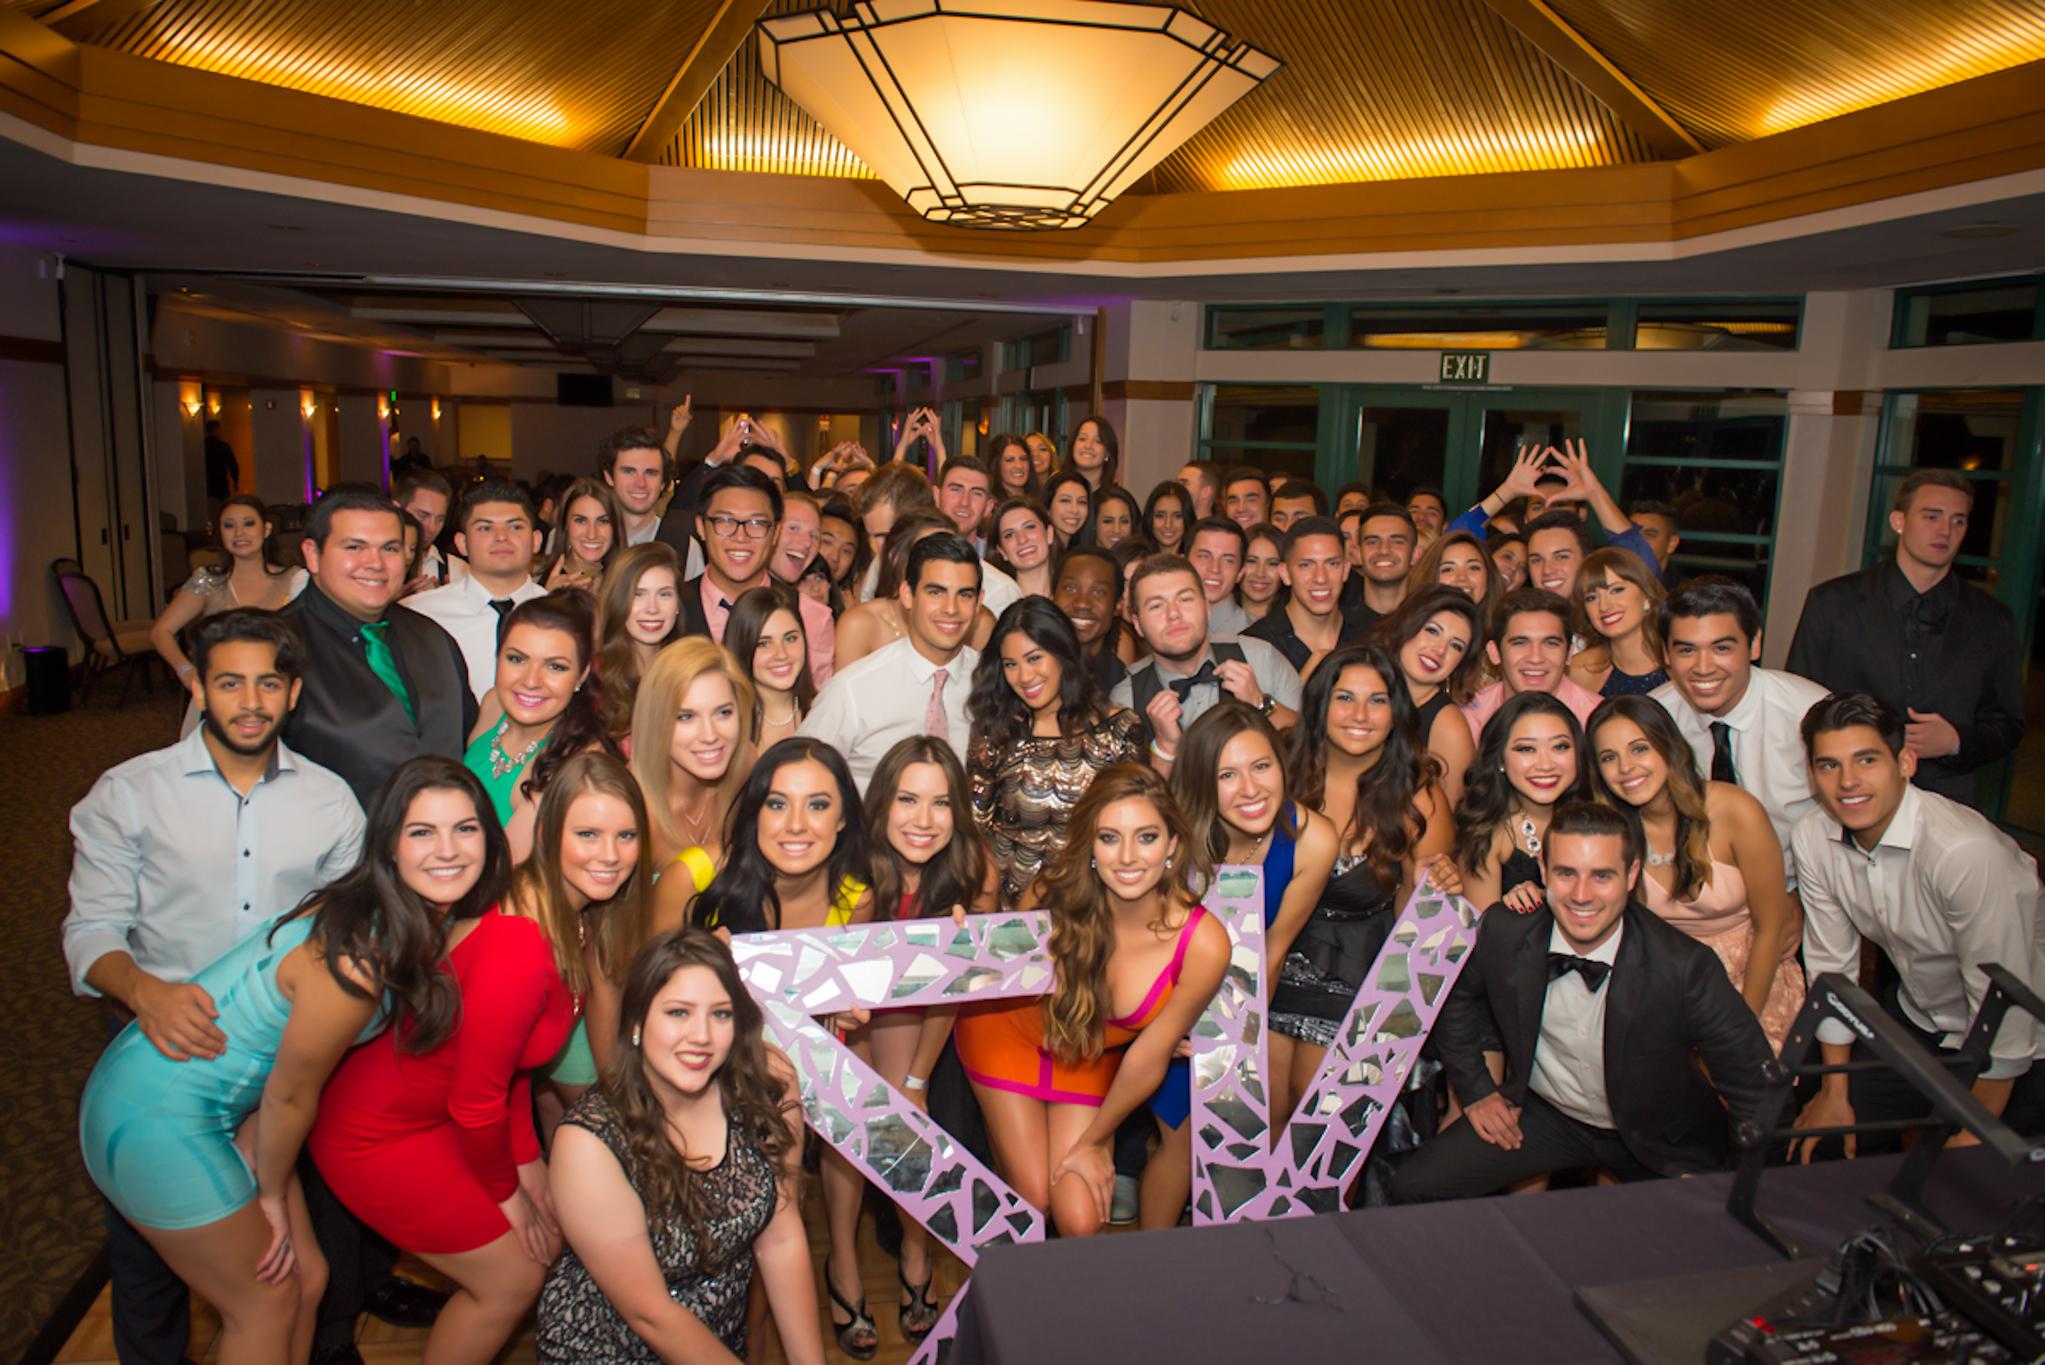 University of La Verne Sigma Kappa Formal 05/01/15